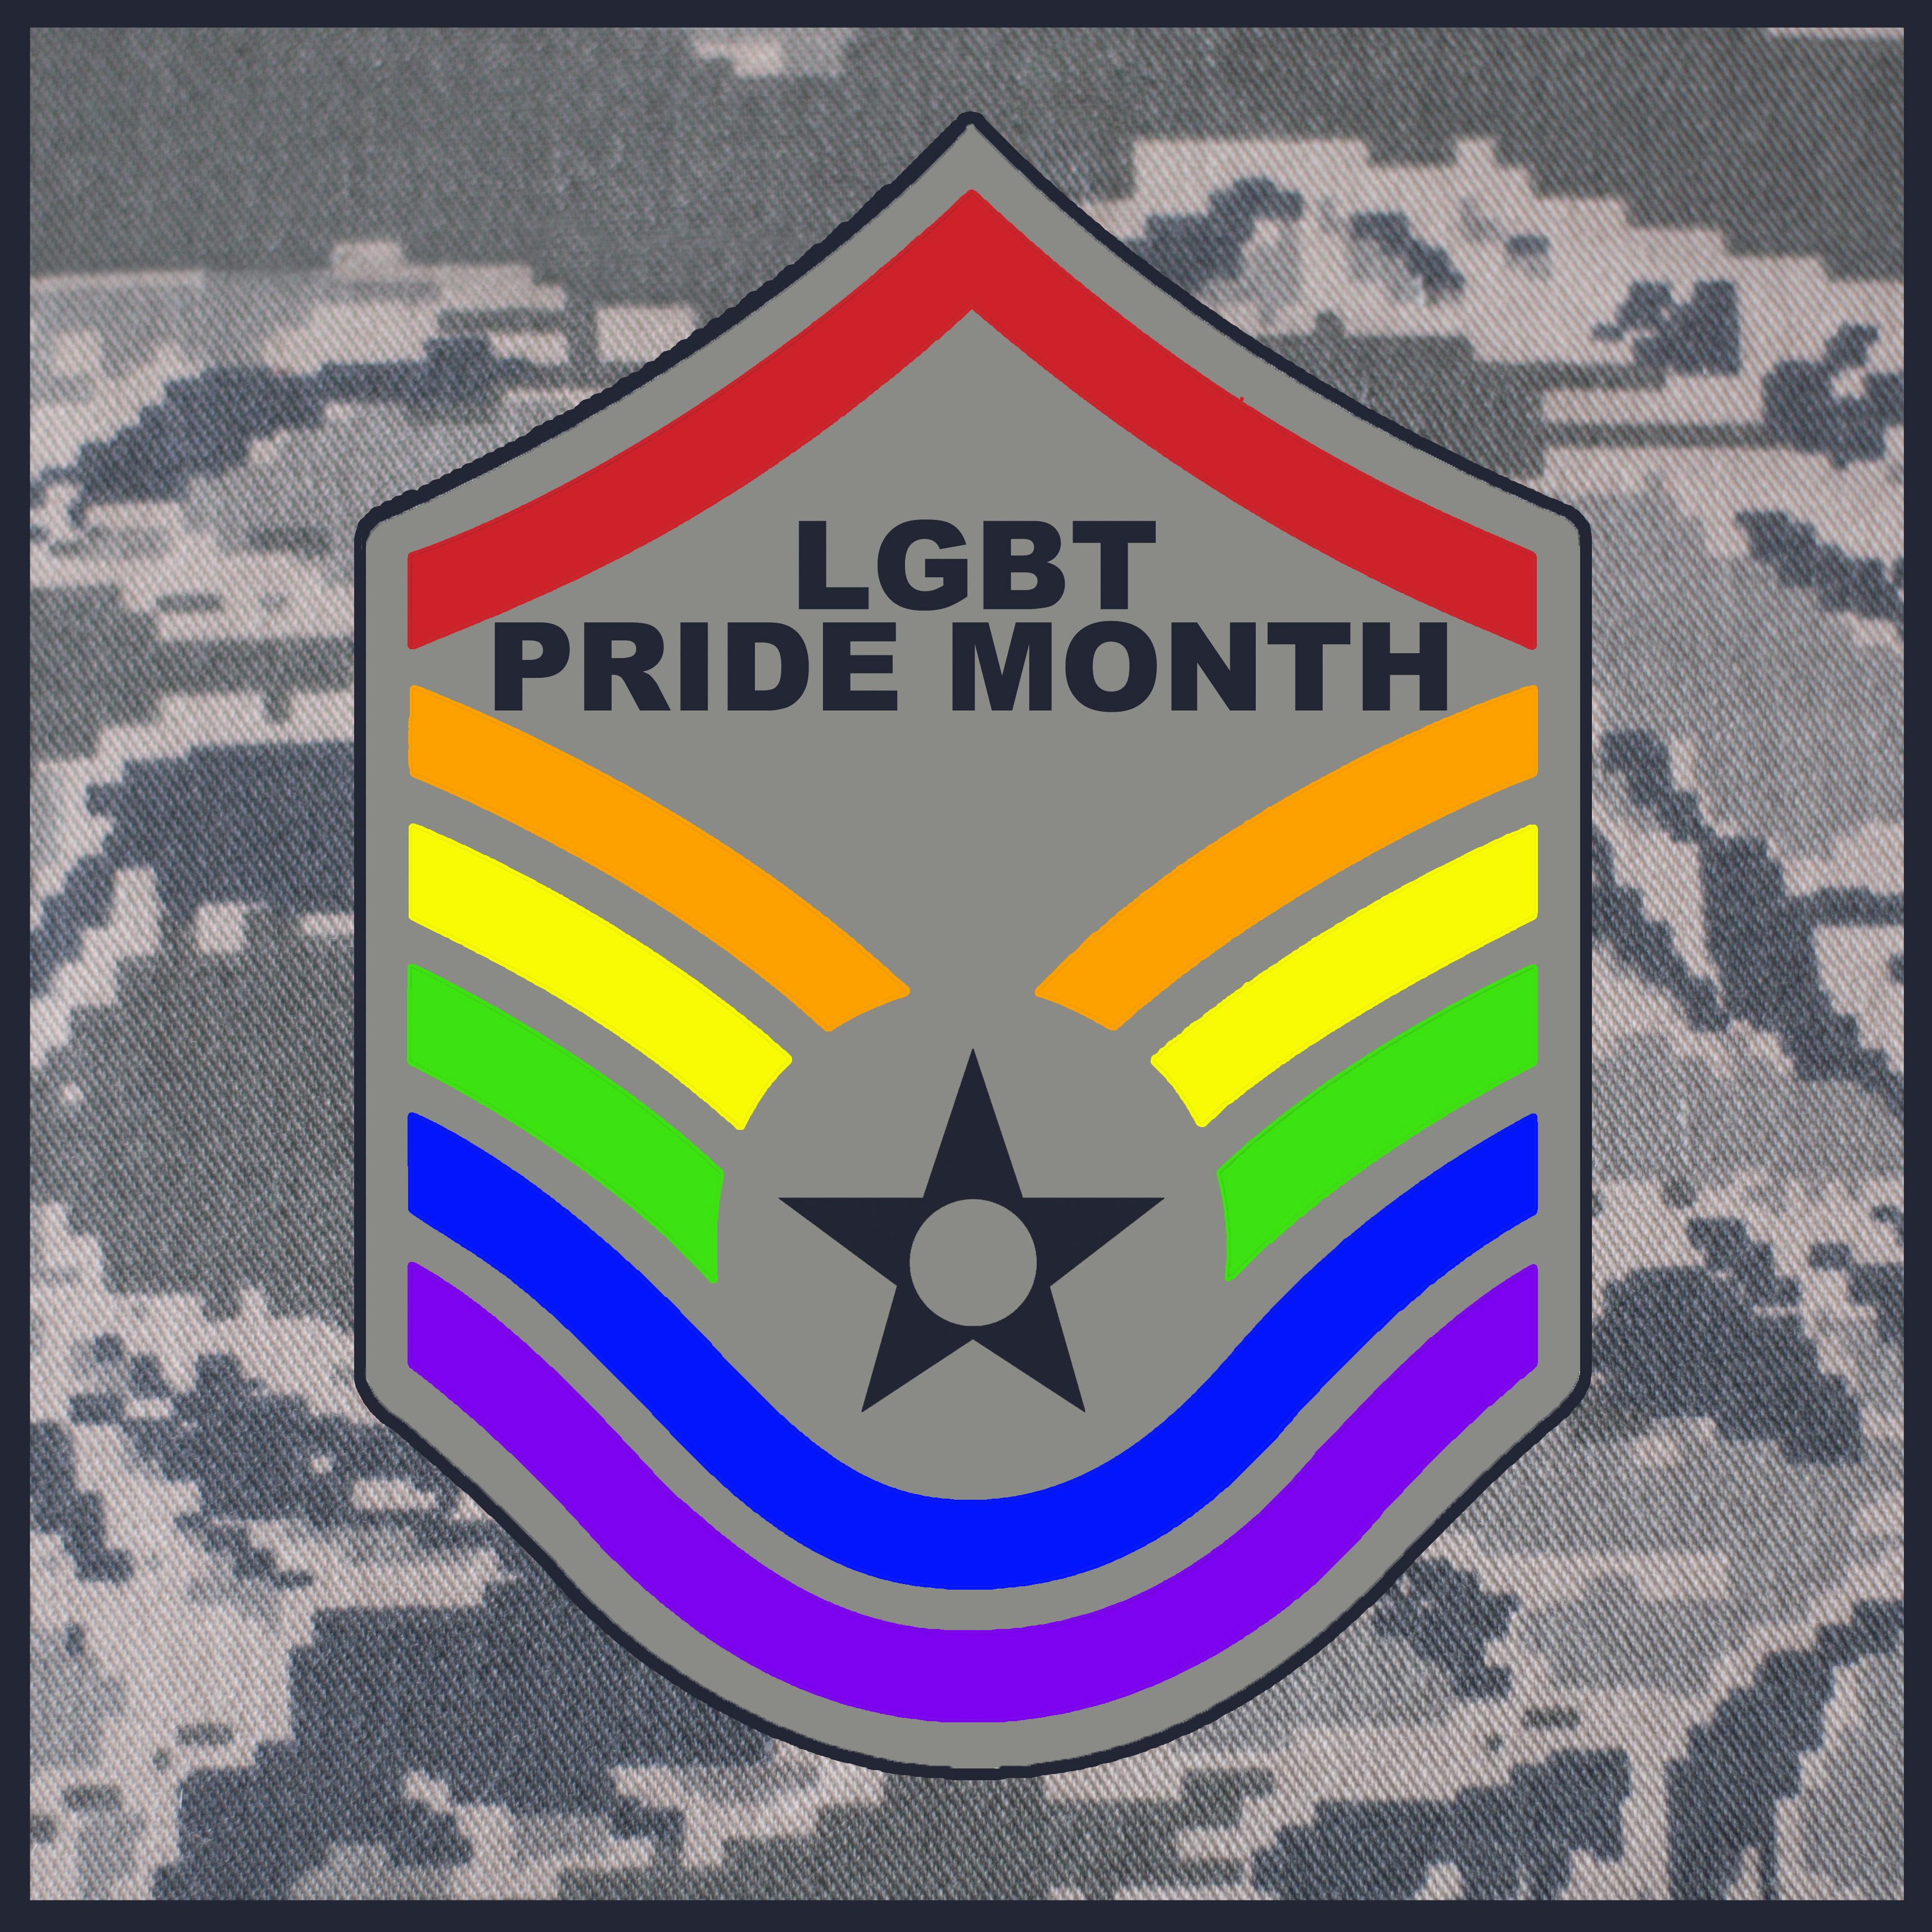 pride month - photo #31